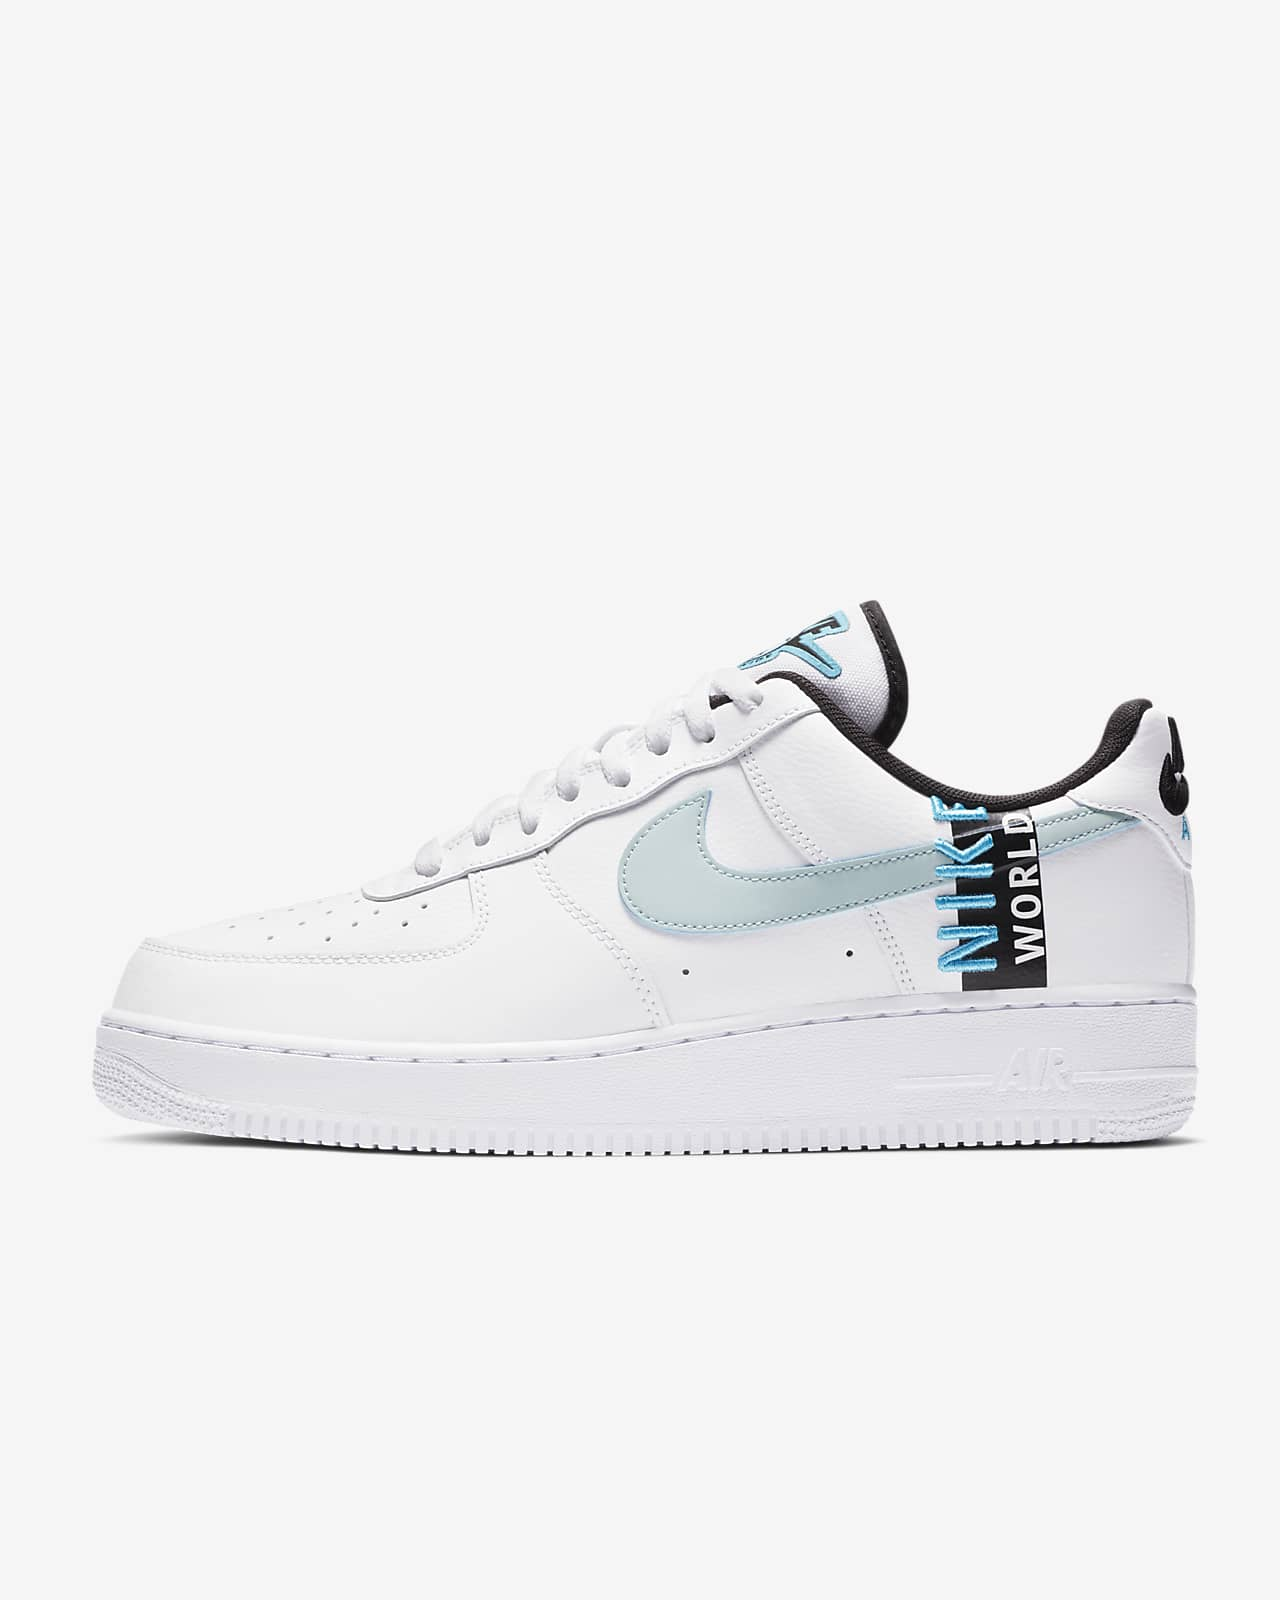 Nike Air Force 1 '07 LV8 WW 男子运动鞋